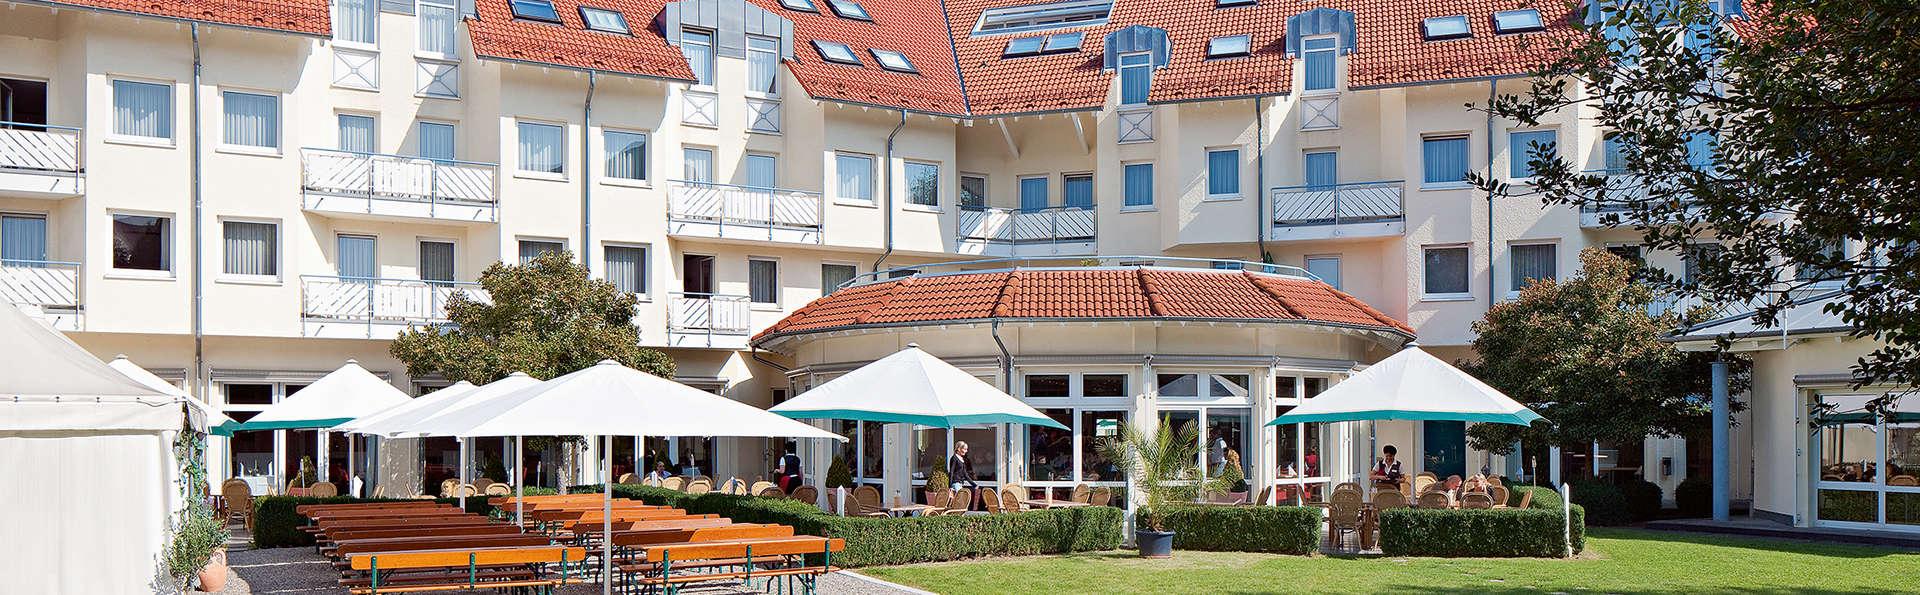 Seminaris Hotel Bad Boll - Edit_Ext.jpg